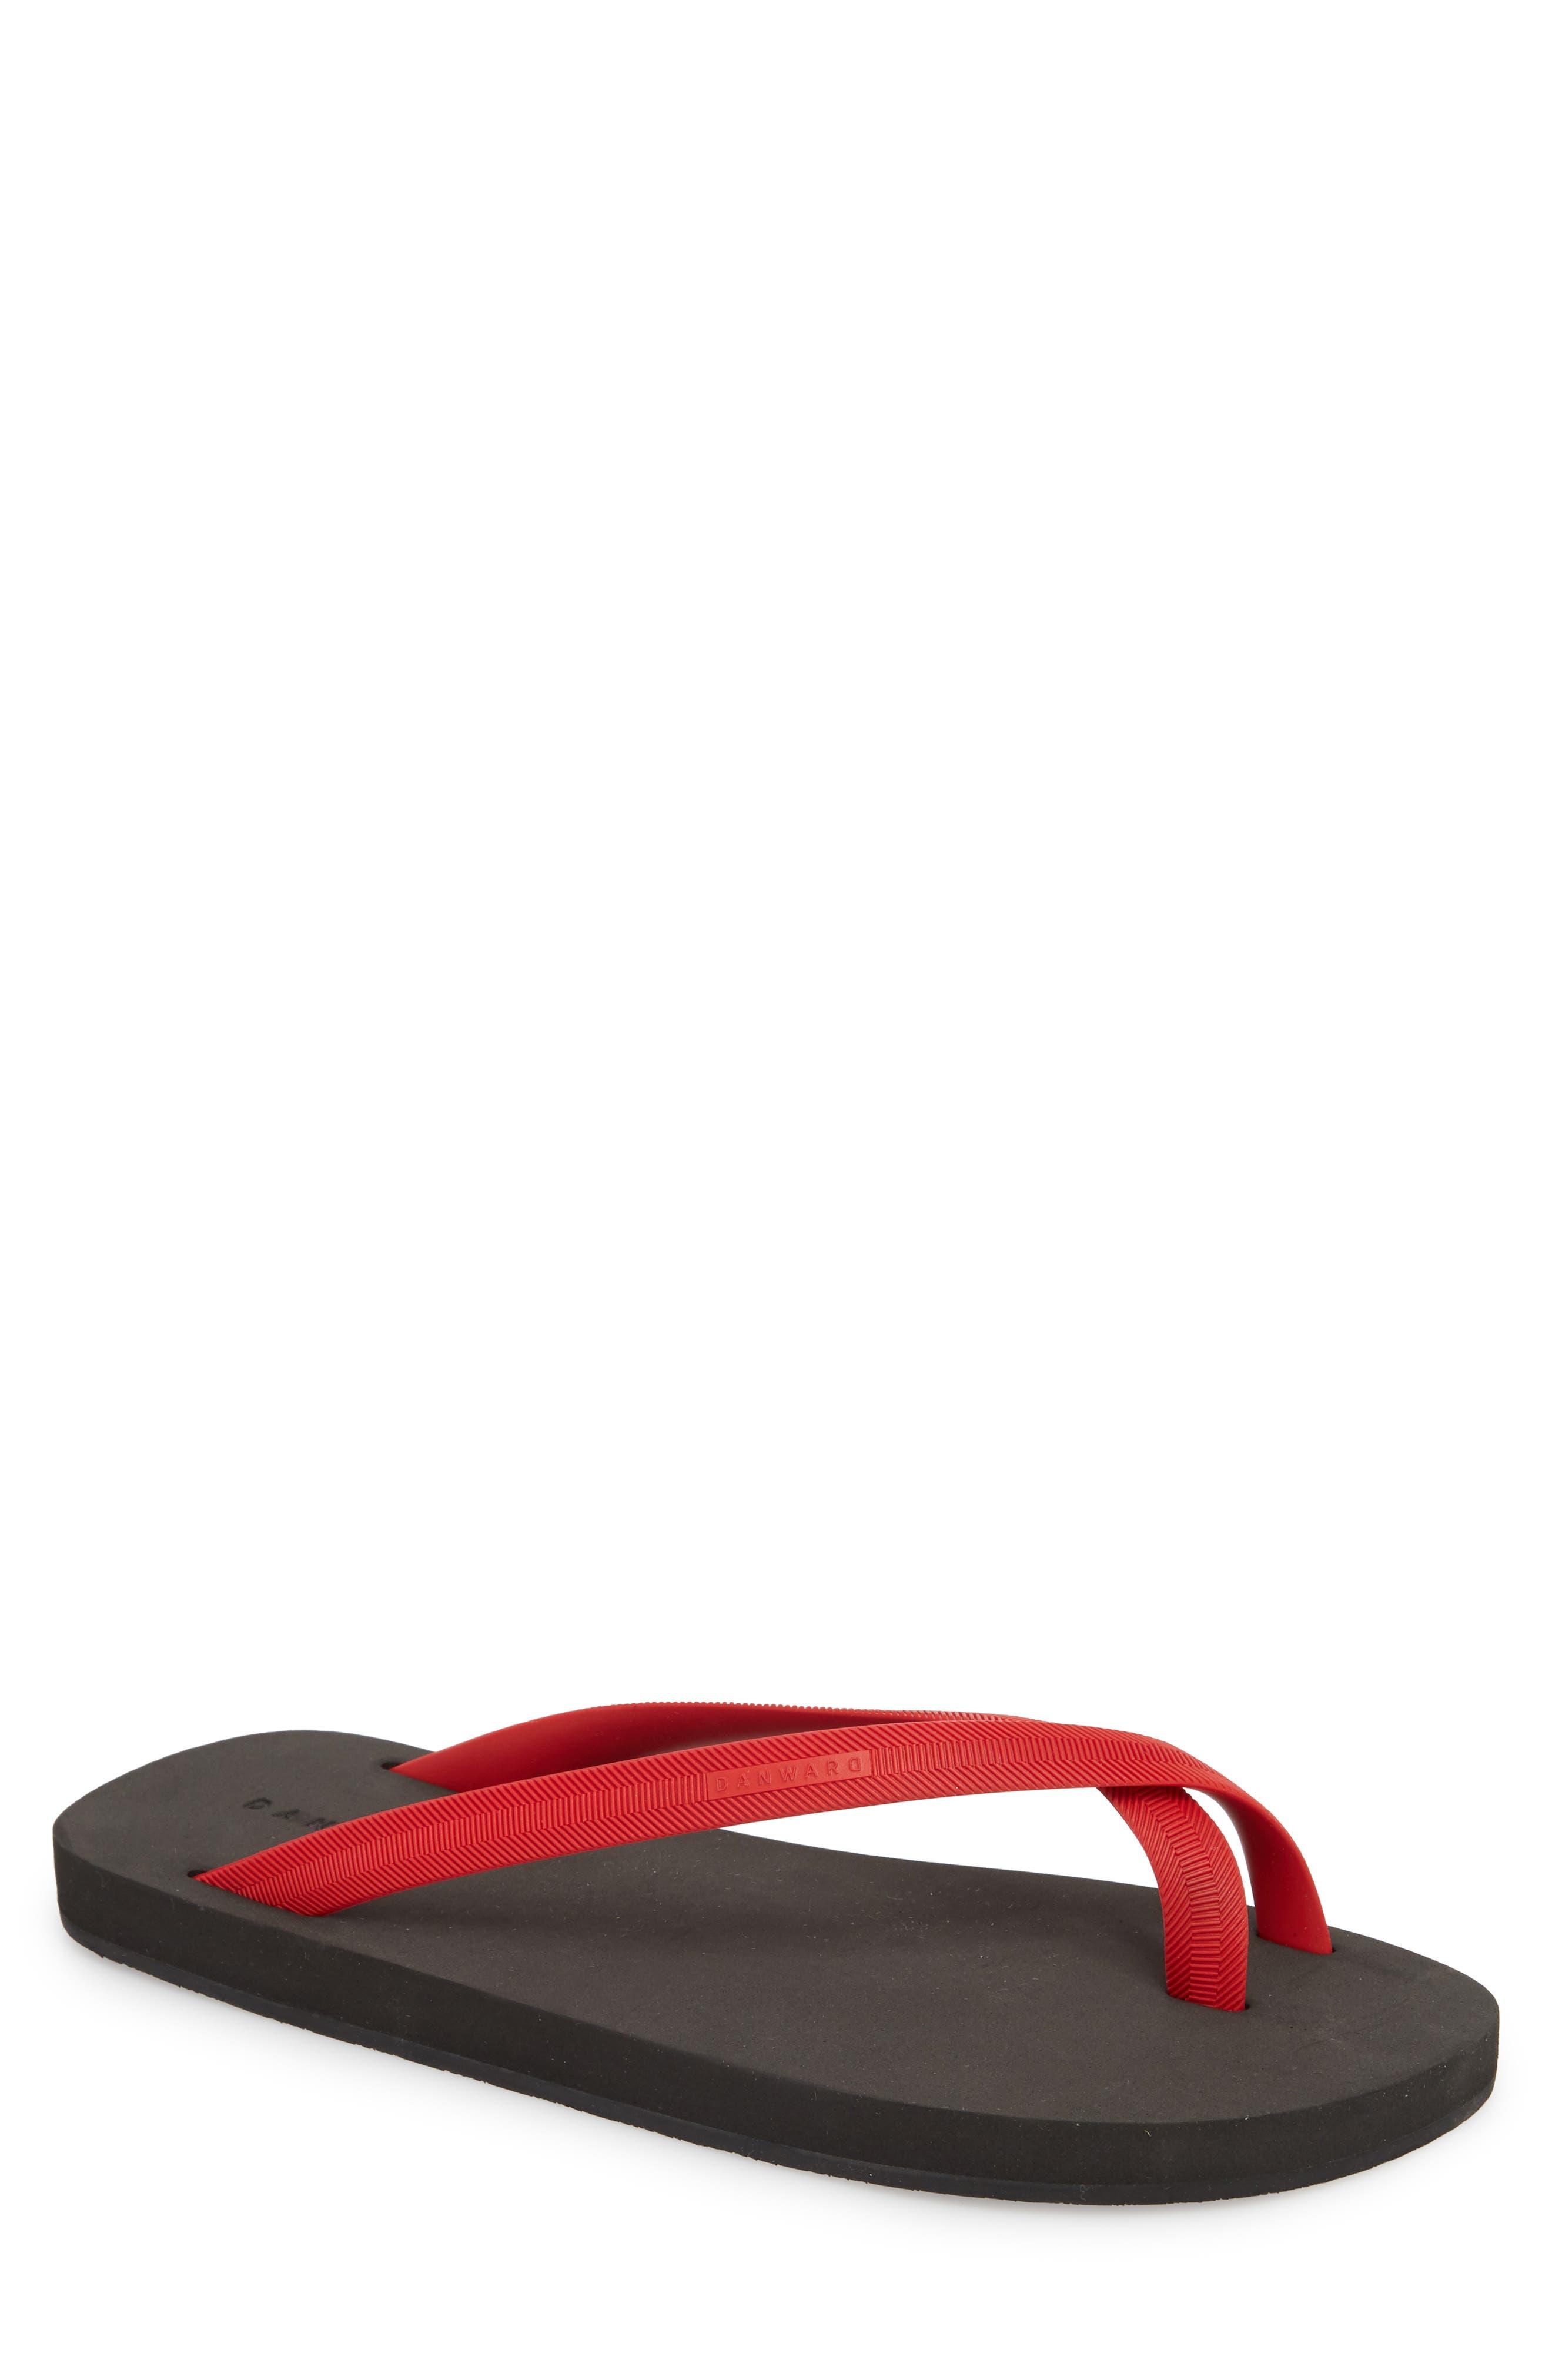 Cross Toe Flip Flop,                             Main thumbnail 1, color,                             Red/ Black